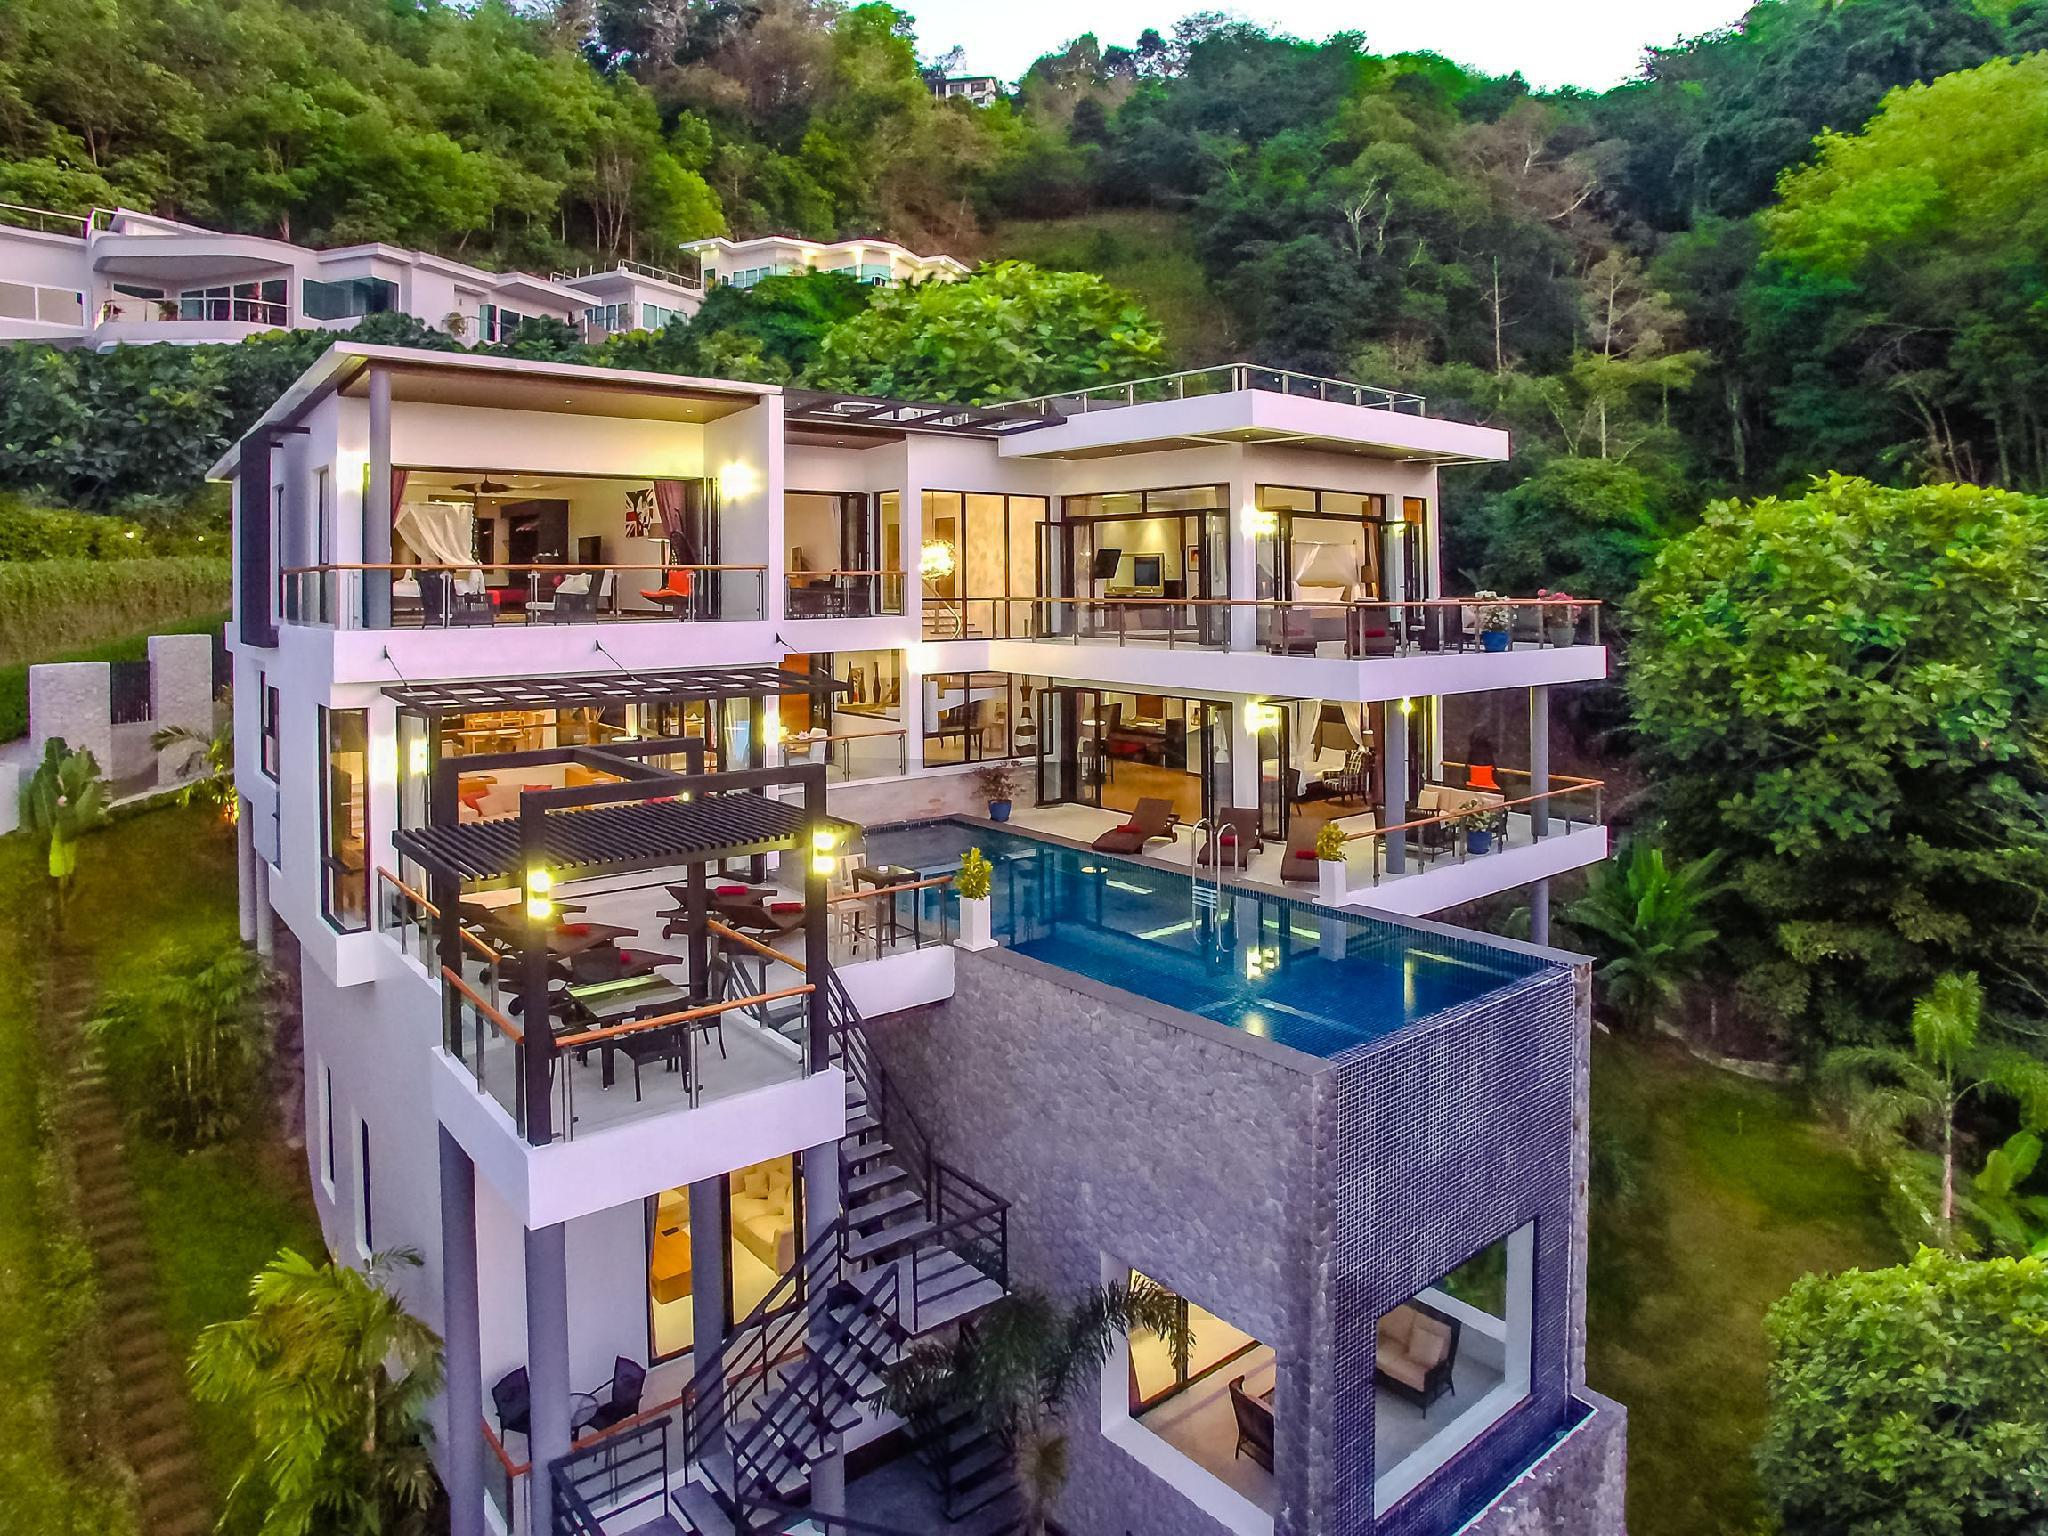 Fully serviced Grand Villa Luxury Time Phuket วิลลา 6 ห้องนอน 6 ห้องน้ำส่วนตัว ขนาด 1100 ตร.ม. – สุรินทร์